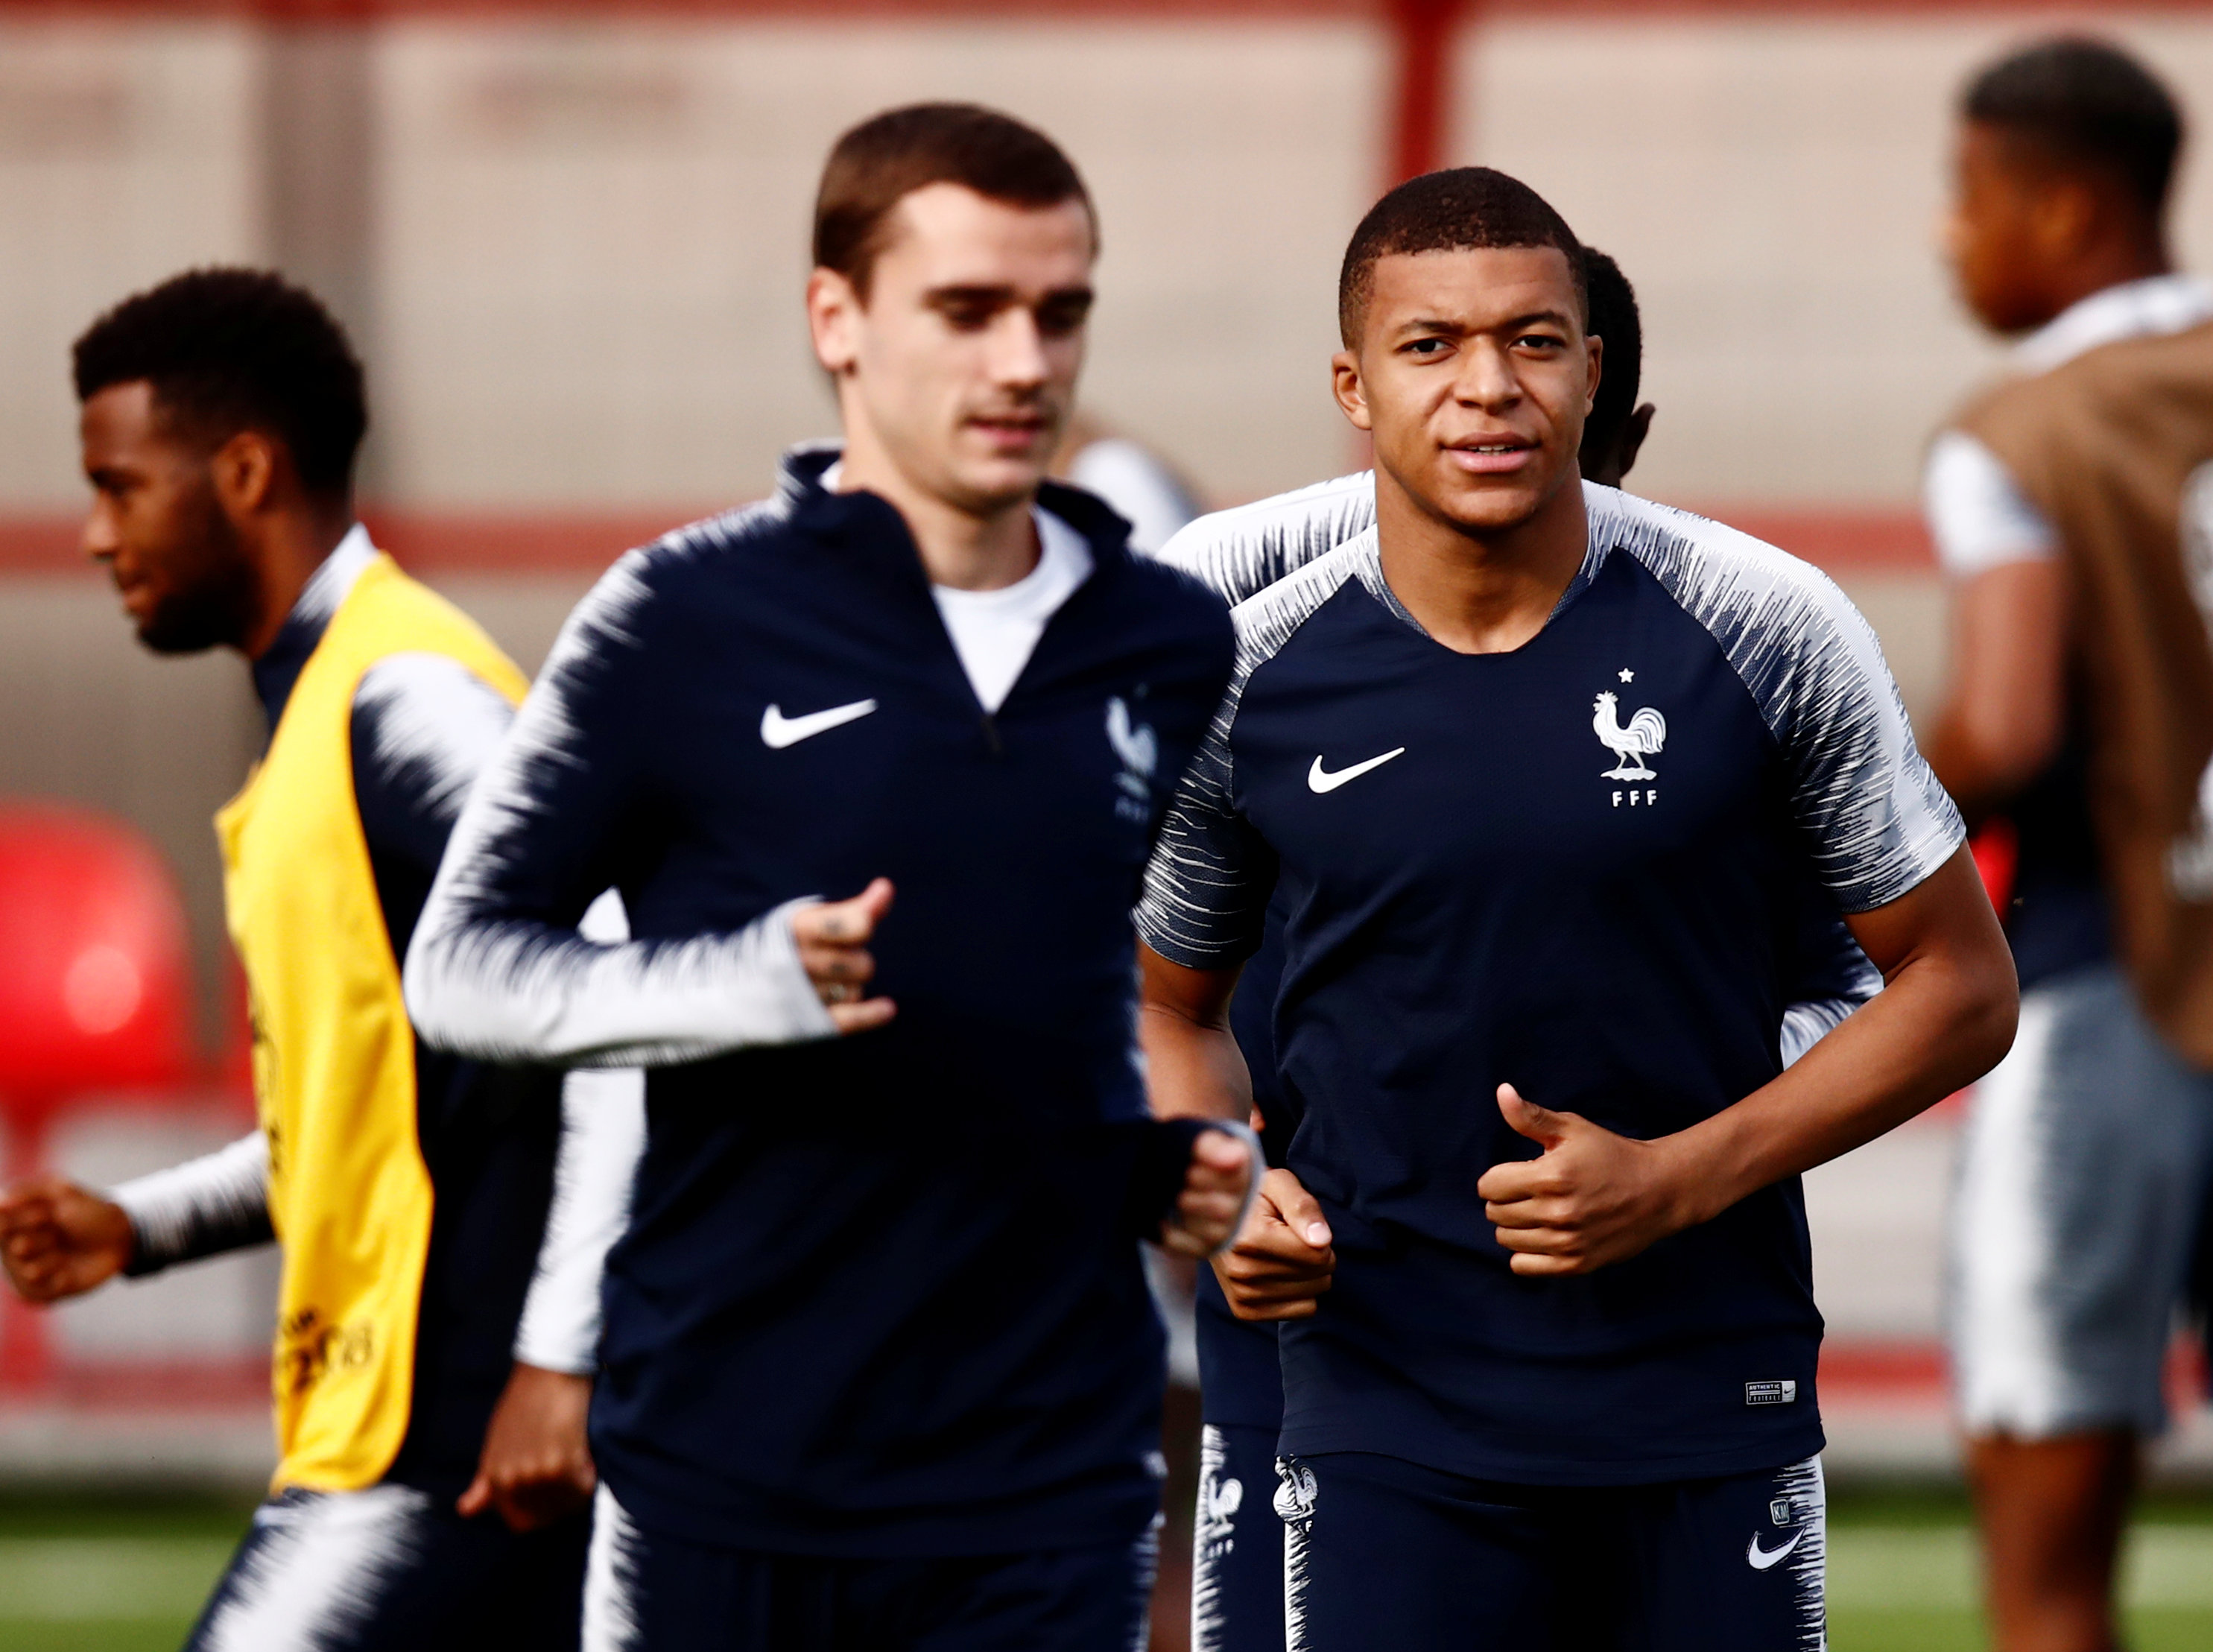 France vs Croatia team news and betting tips